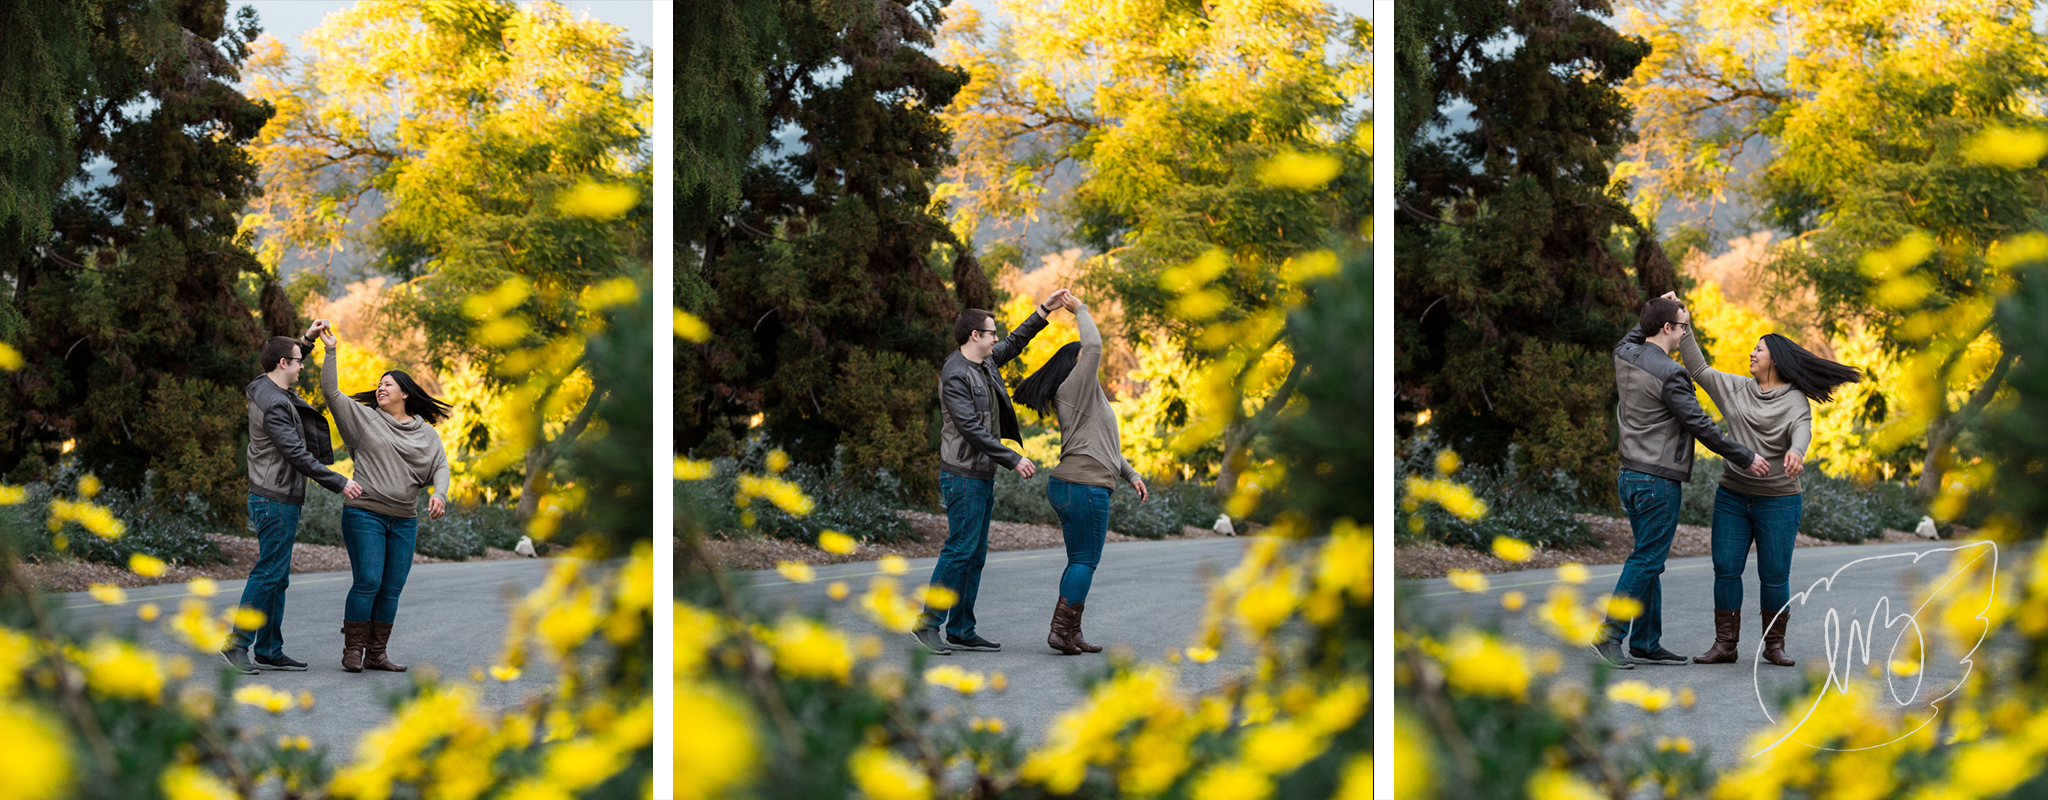 Los_Angeles_Arboretum_Engagement_Photographer_09.jpg